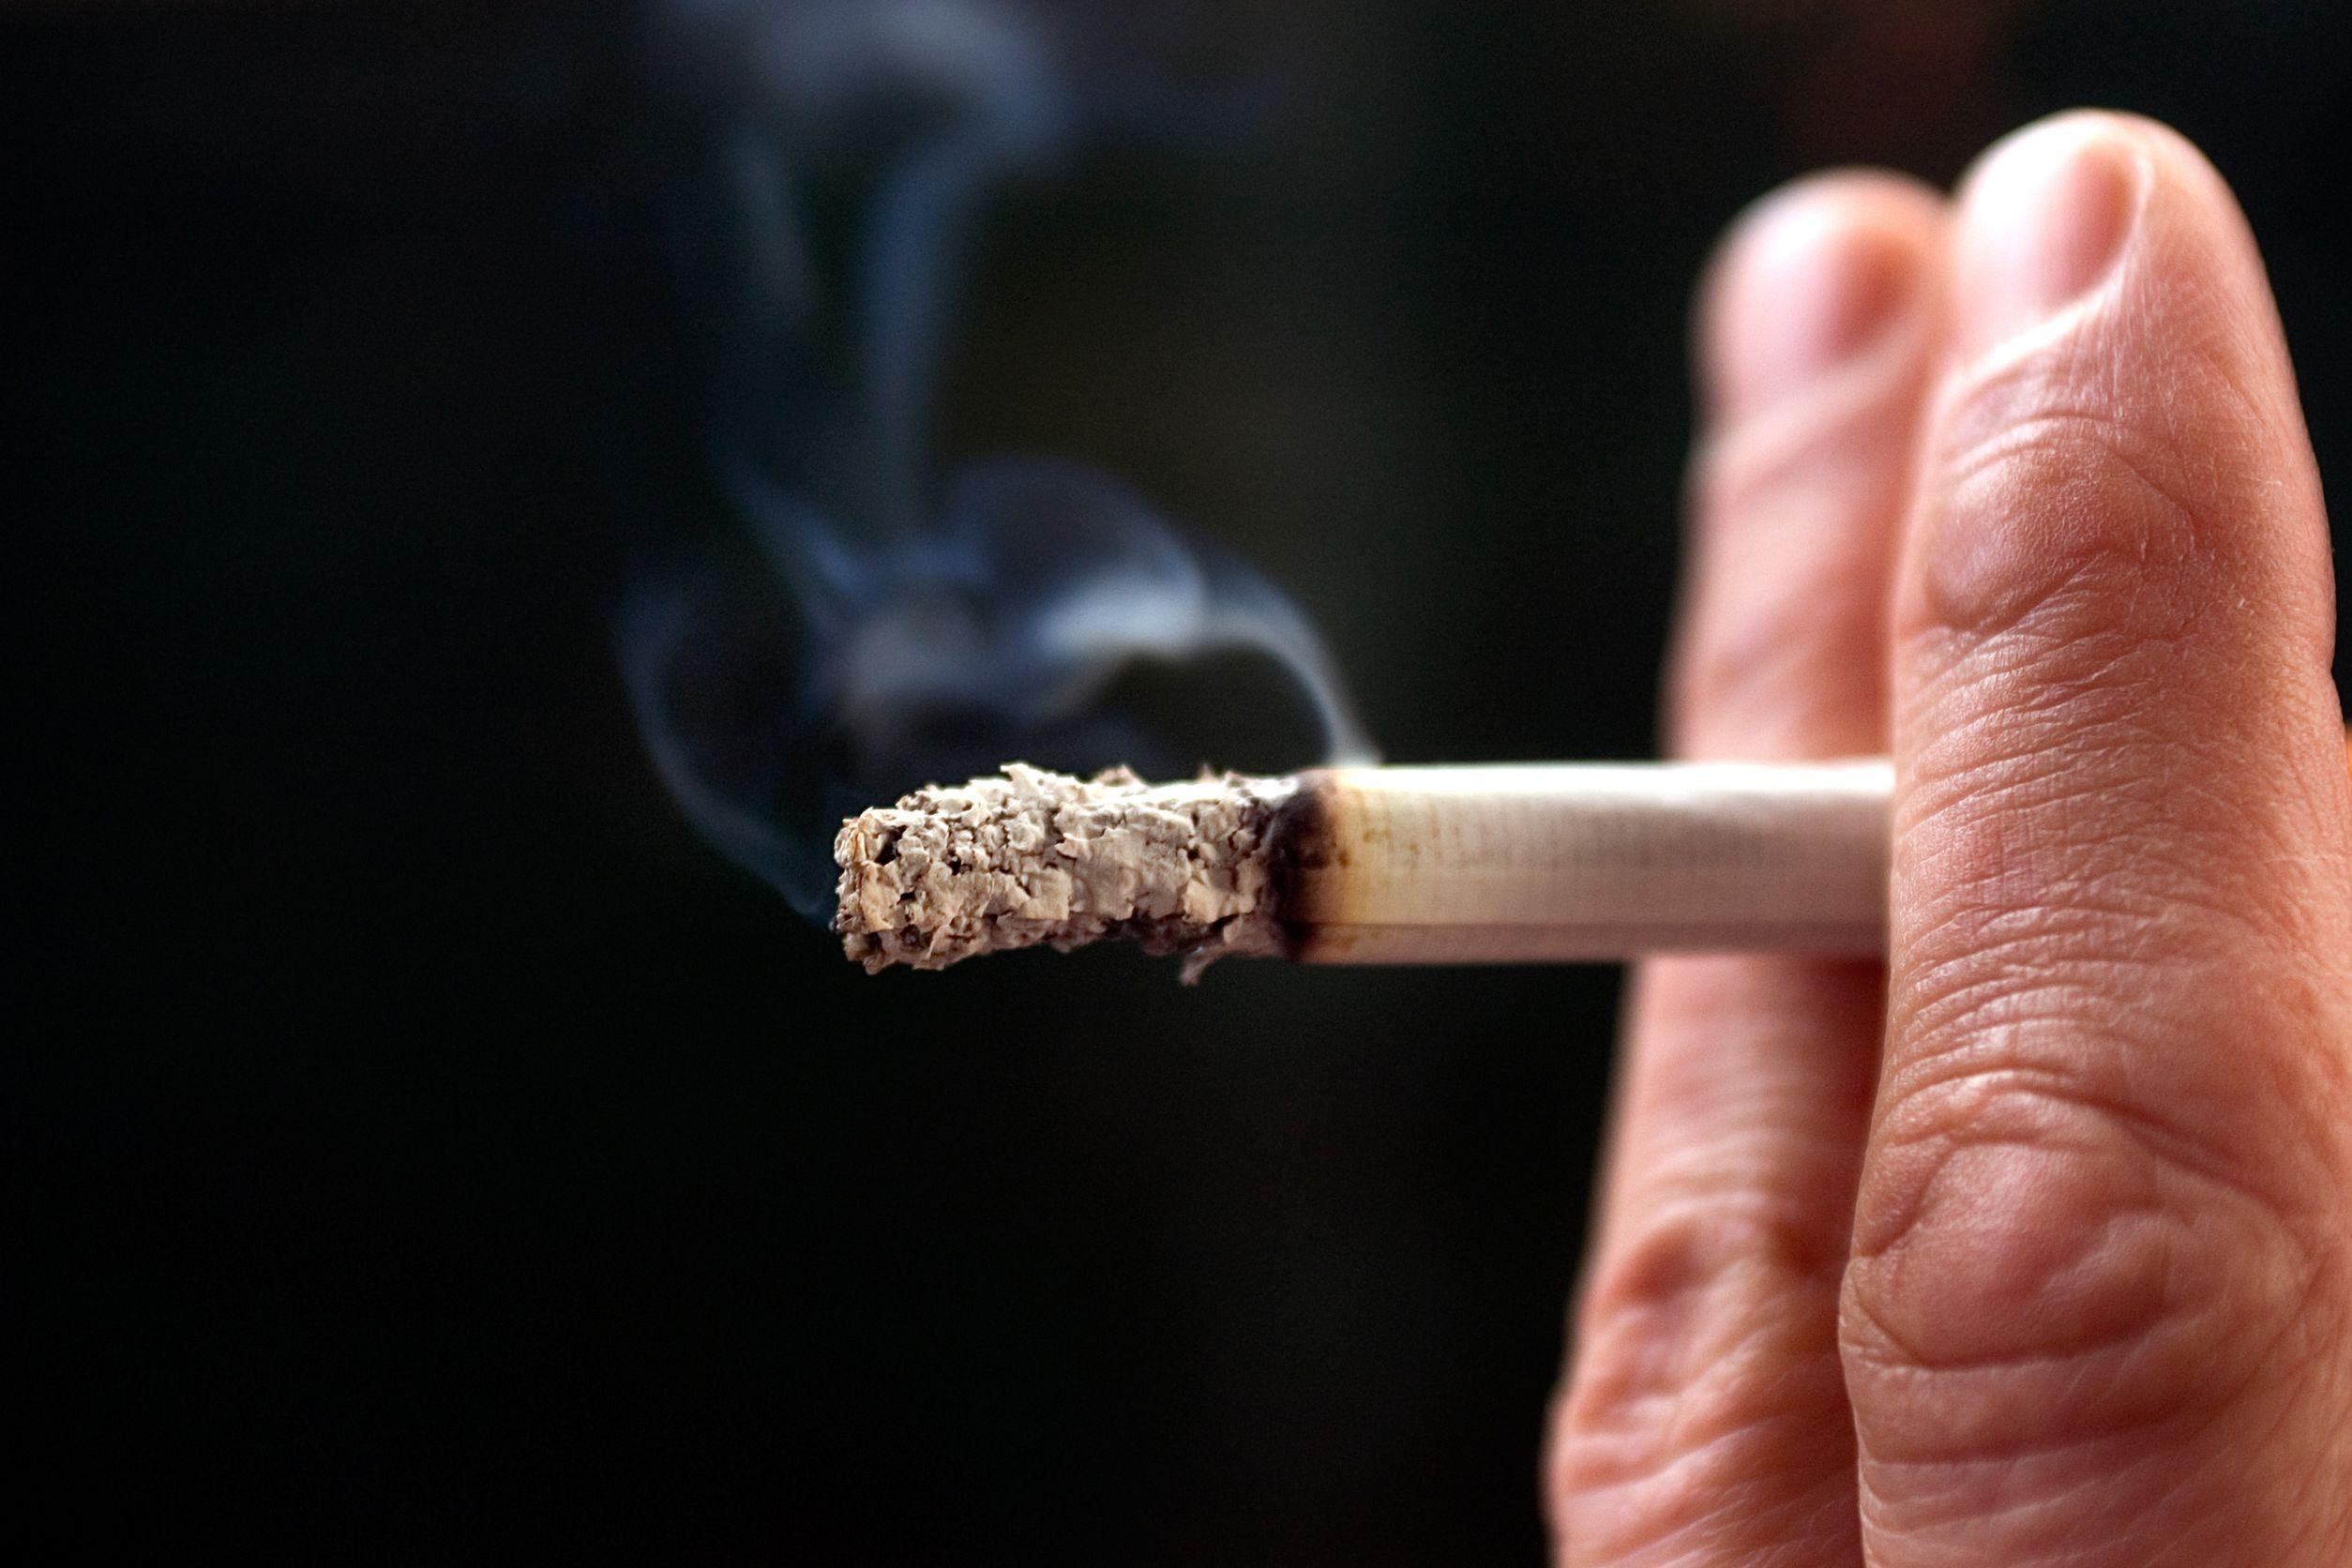 Картинки о курении, годом вероника